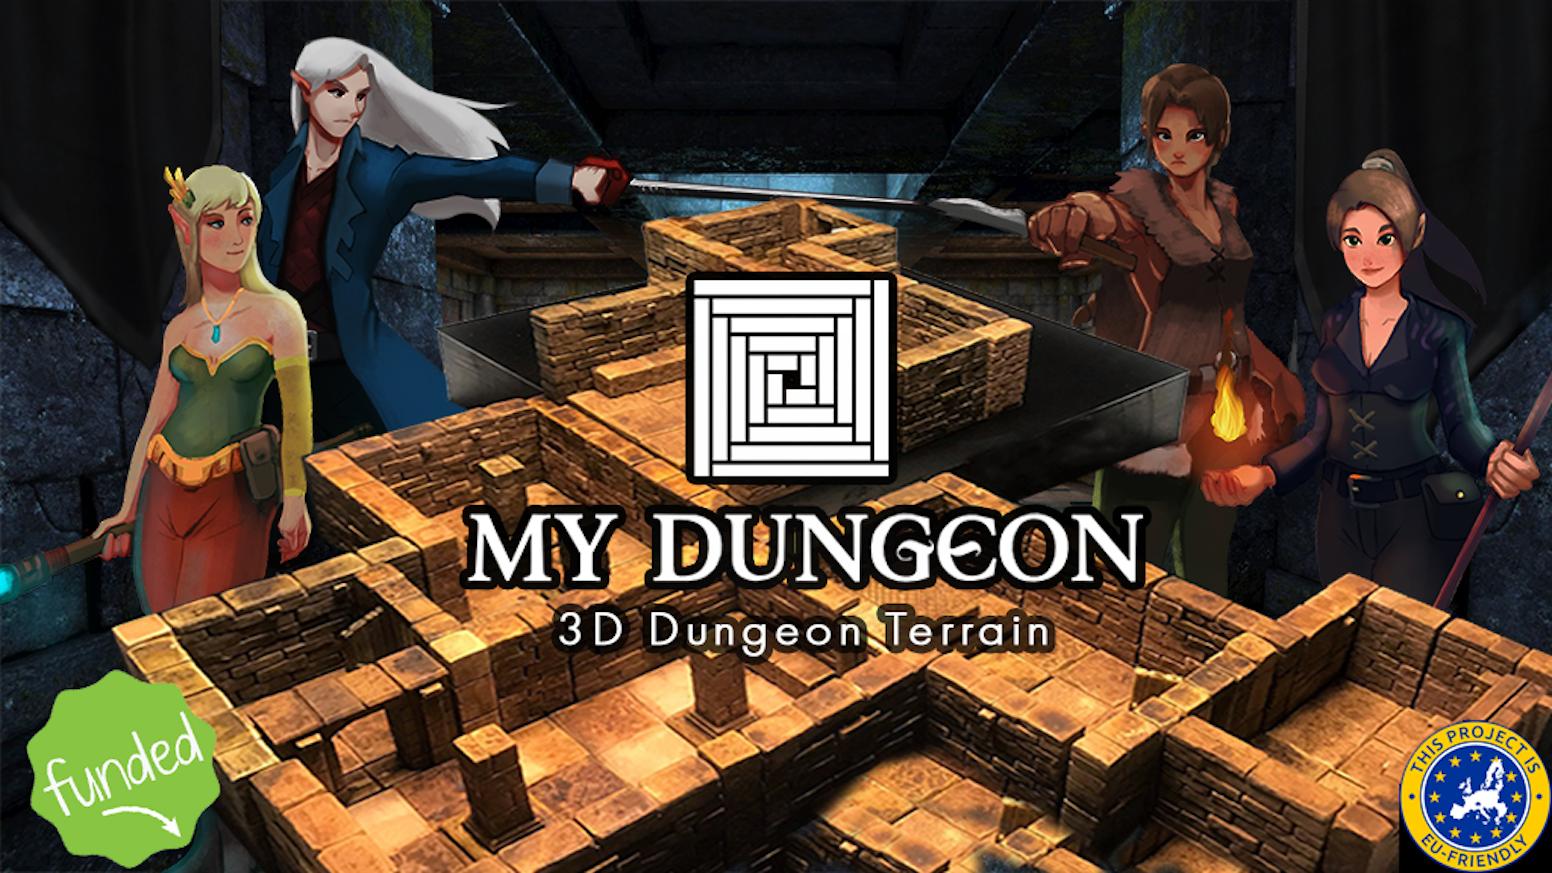 My Dungeon 3d Dungeon Terrain By Jose Moscoso Kickstarter